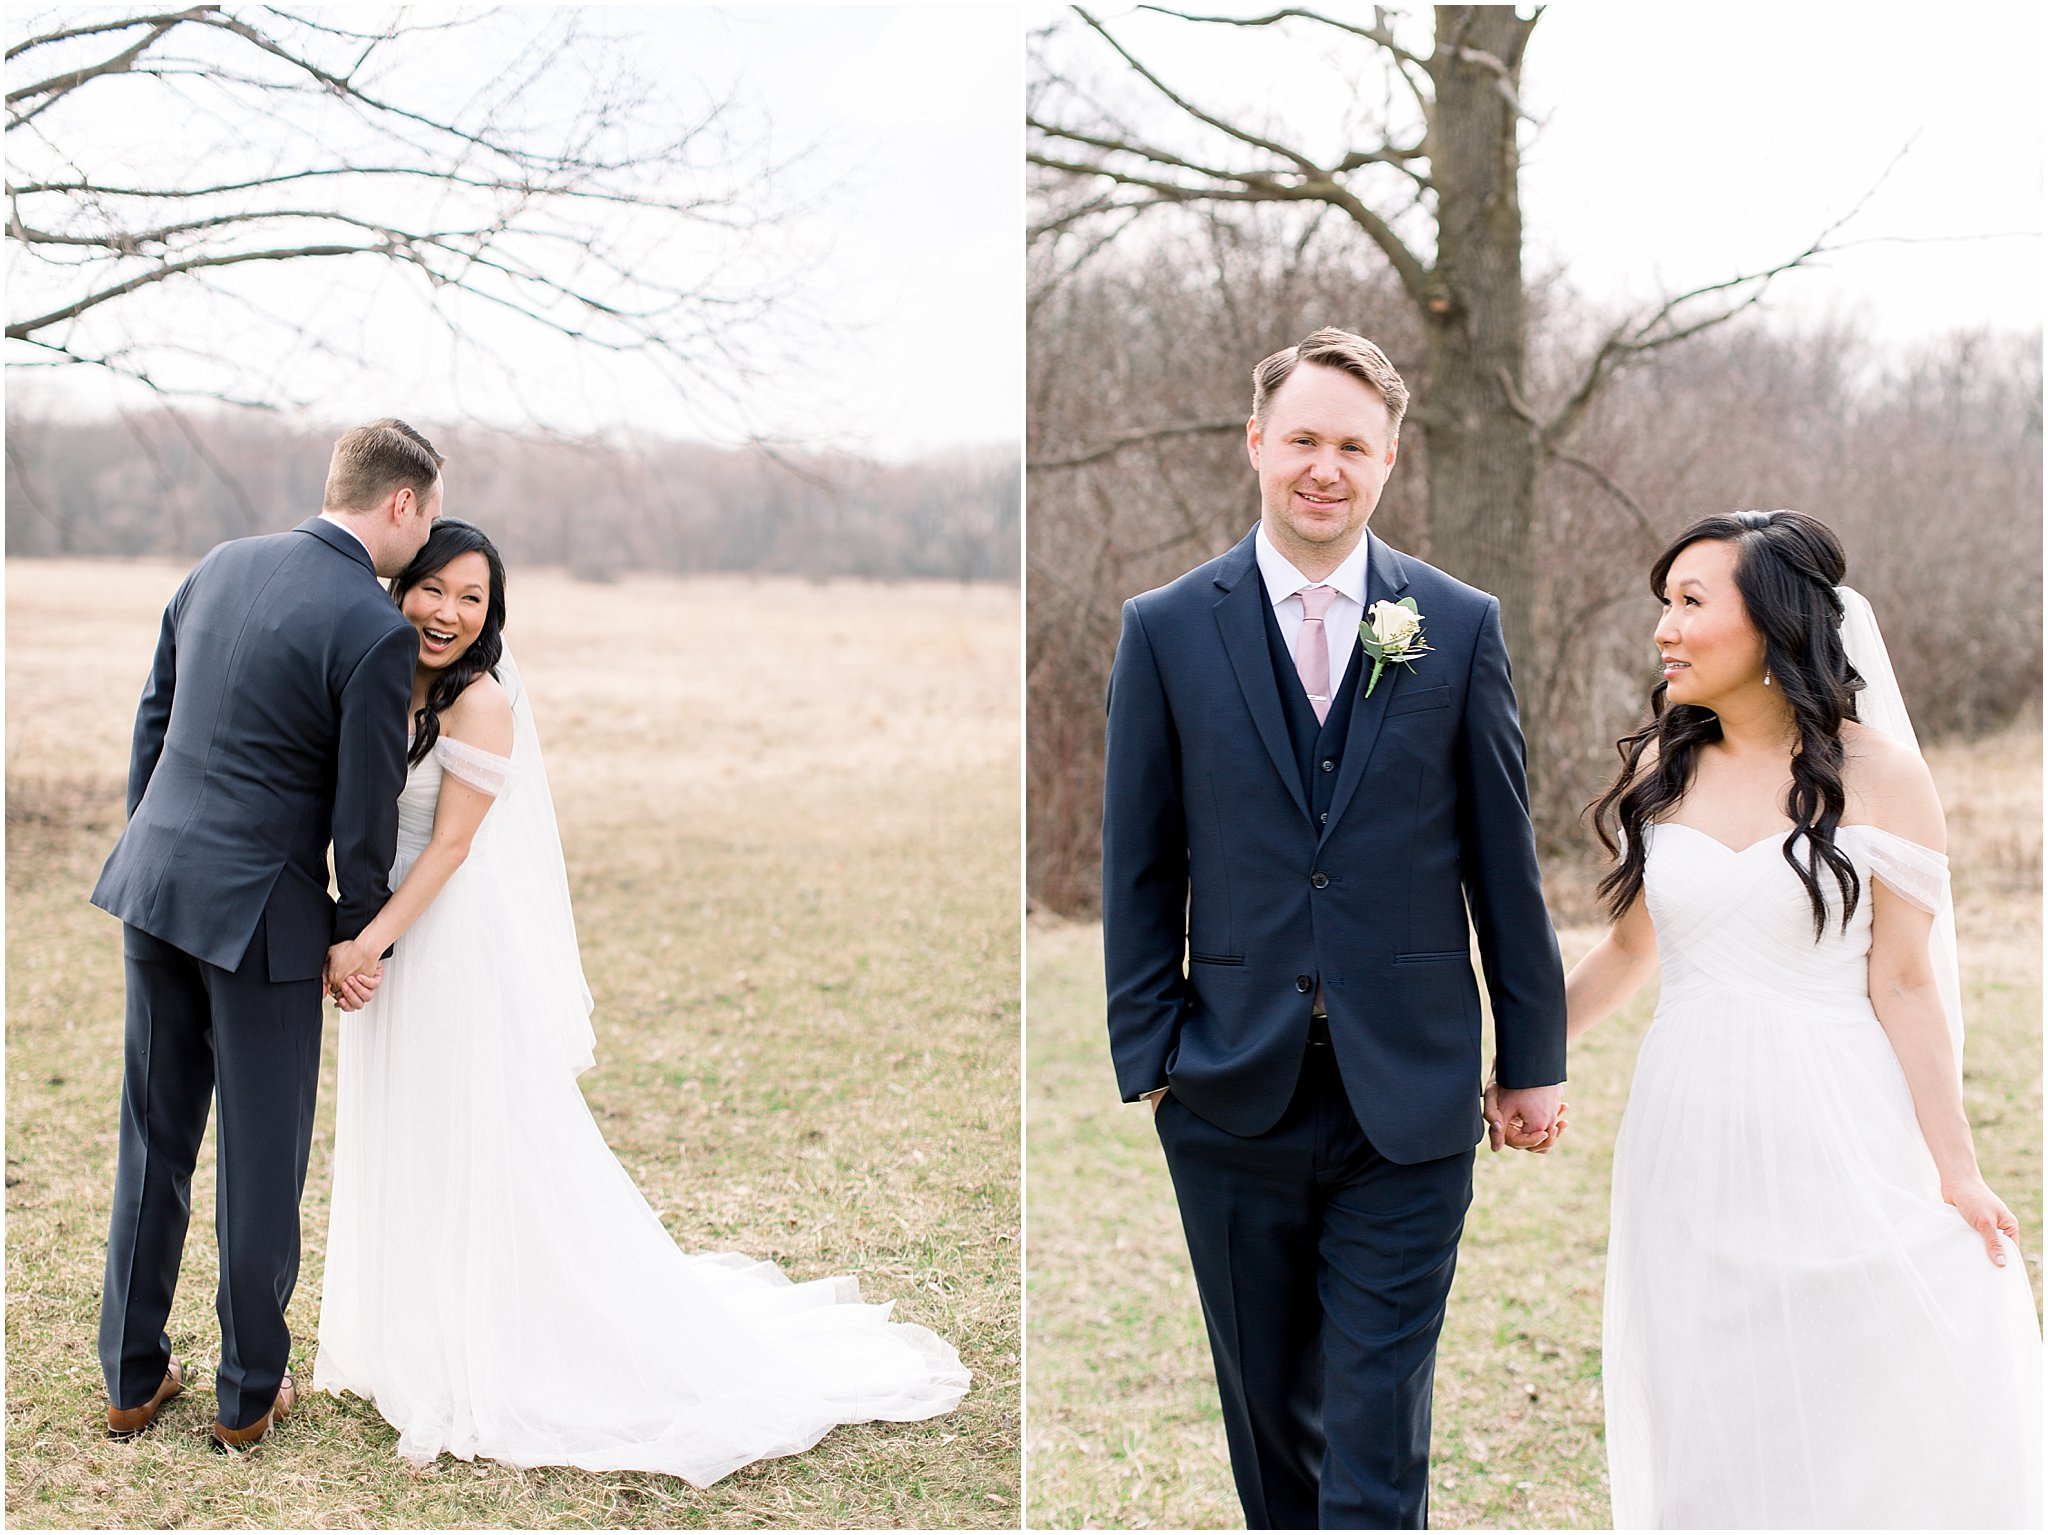 metropolis-ballroom-spring-wedding-photo_0021.jpg